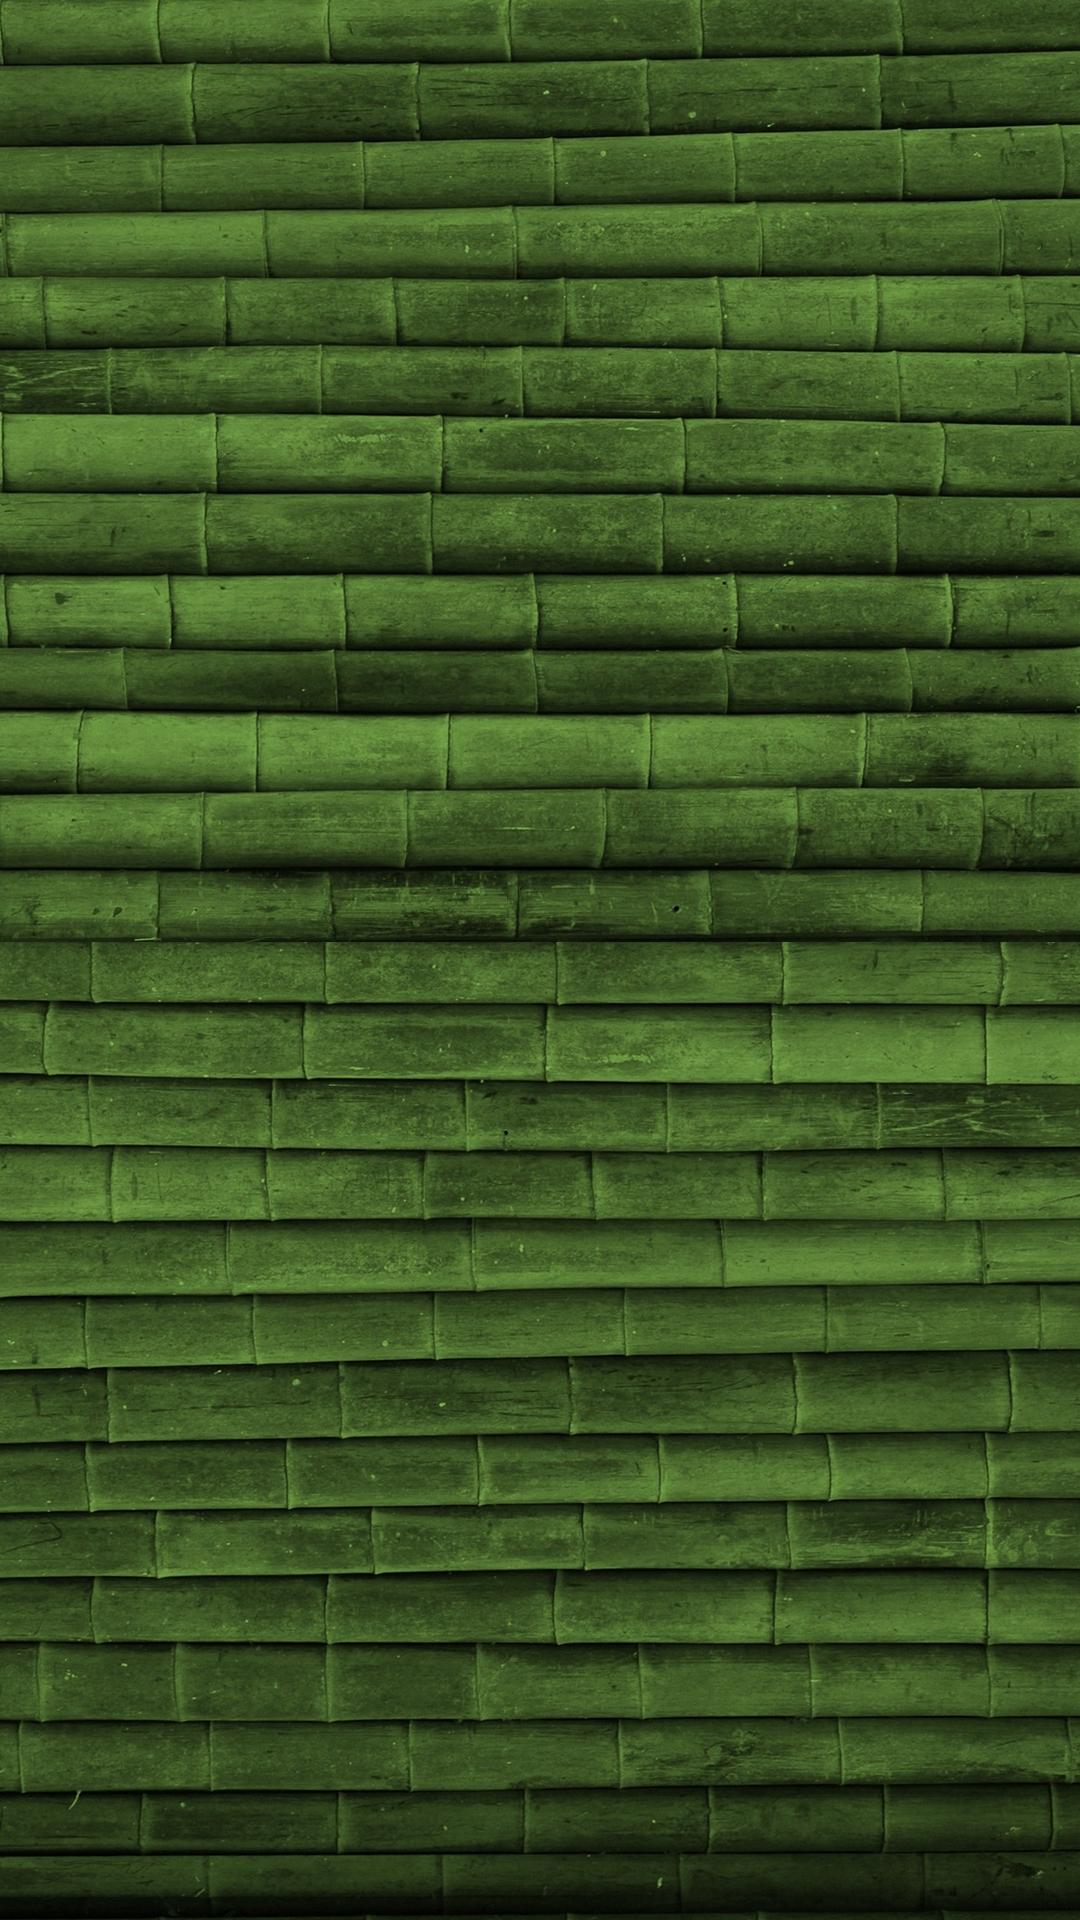 Green Bamboo Wood Texture iPhone 6 Plus HD Wallpaper iPod Wallpaper 1080x1920